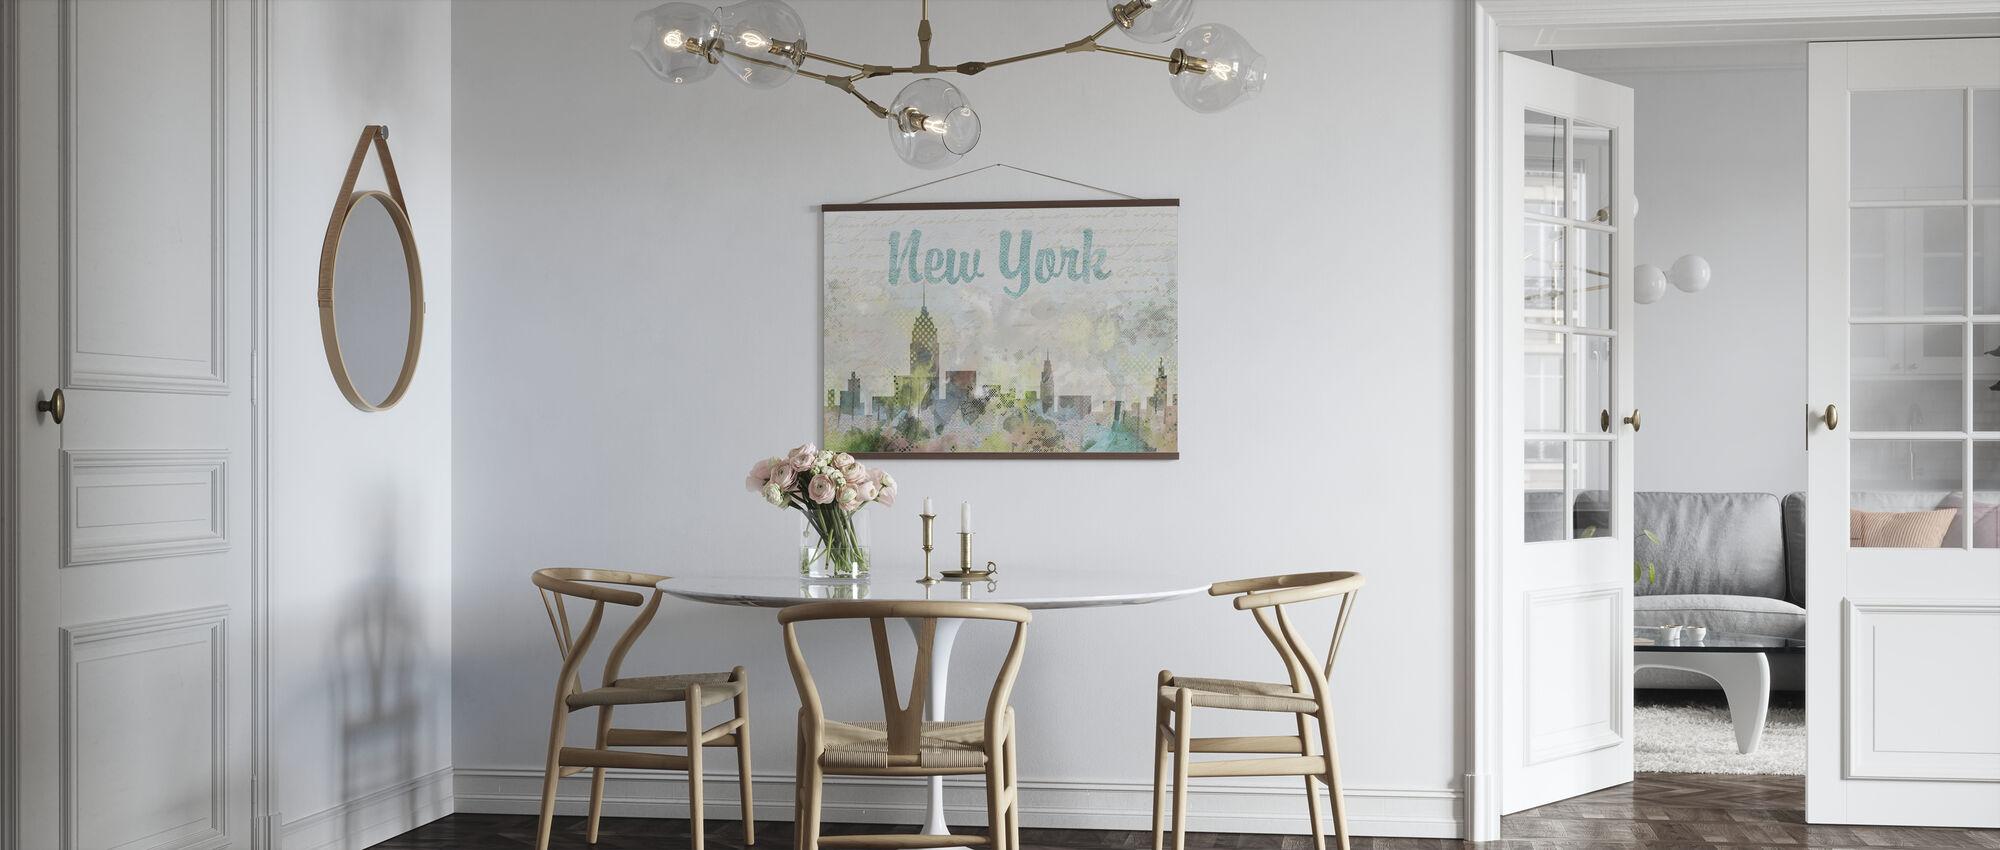 Aquarell New York - Poster - Küchen